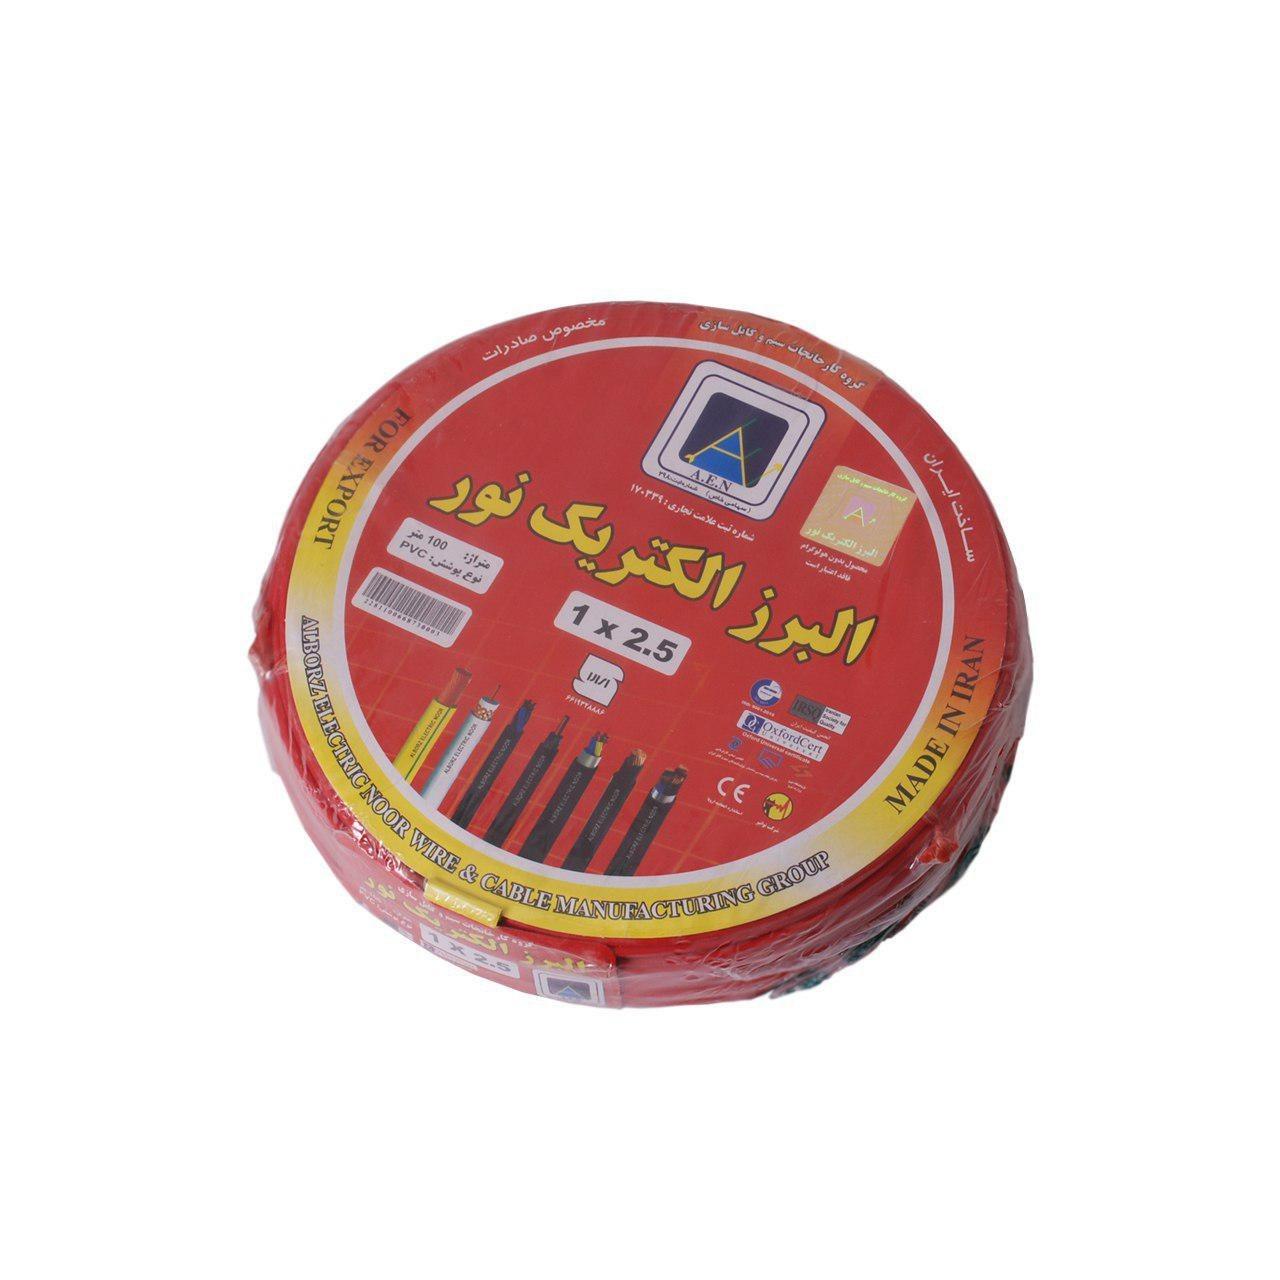 image سیم برق افشان 1 در 2.5 البرز الکترونیک نور مدل 125